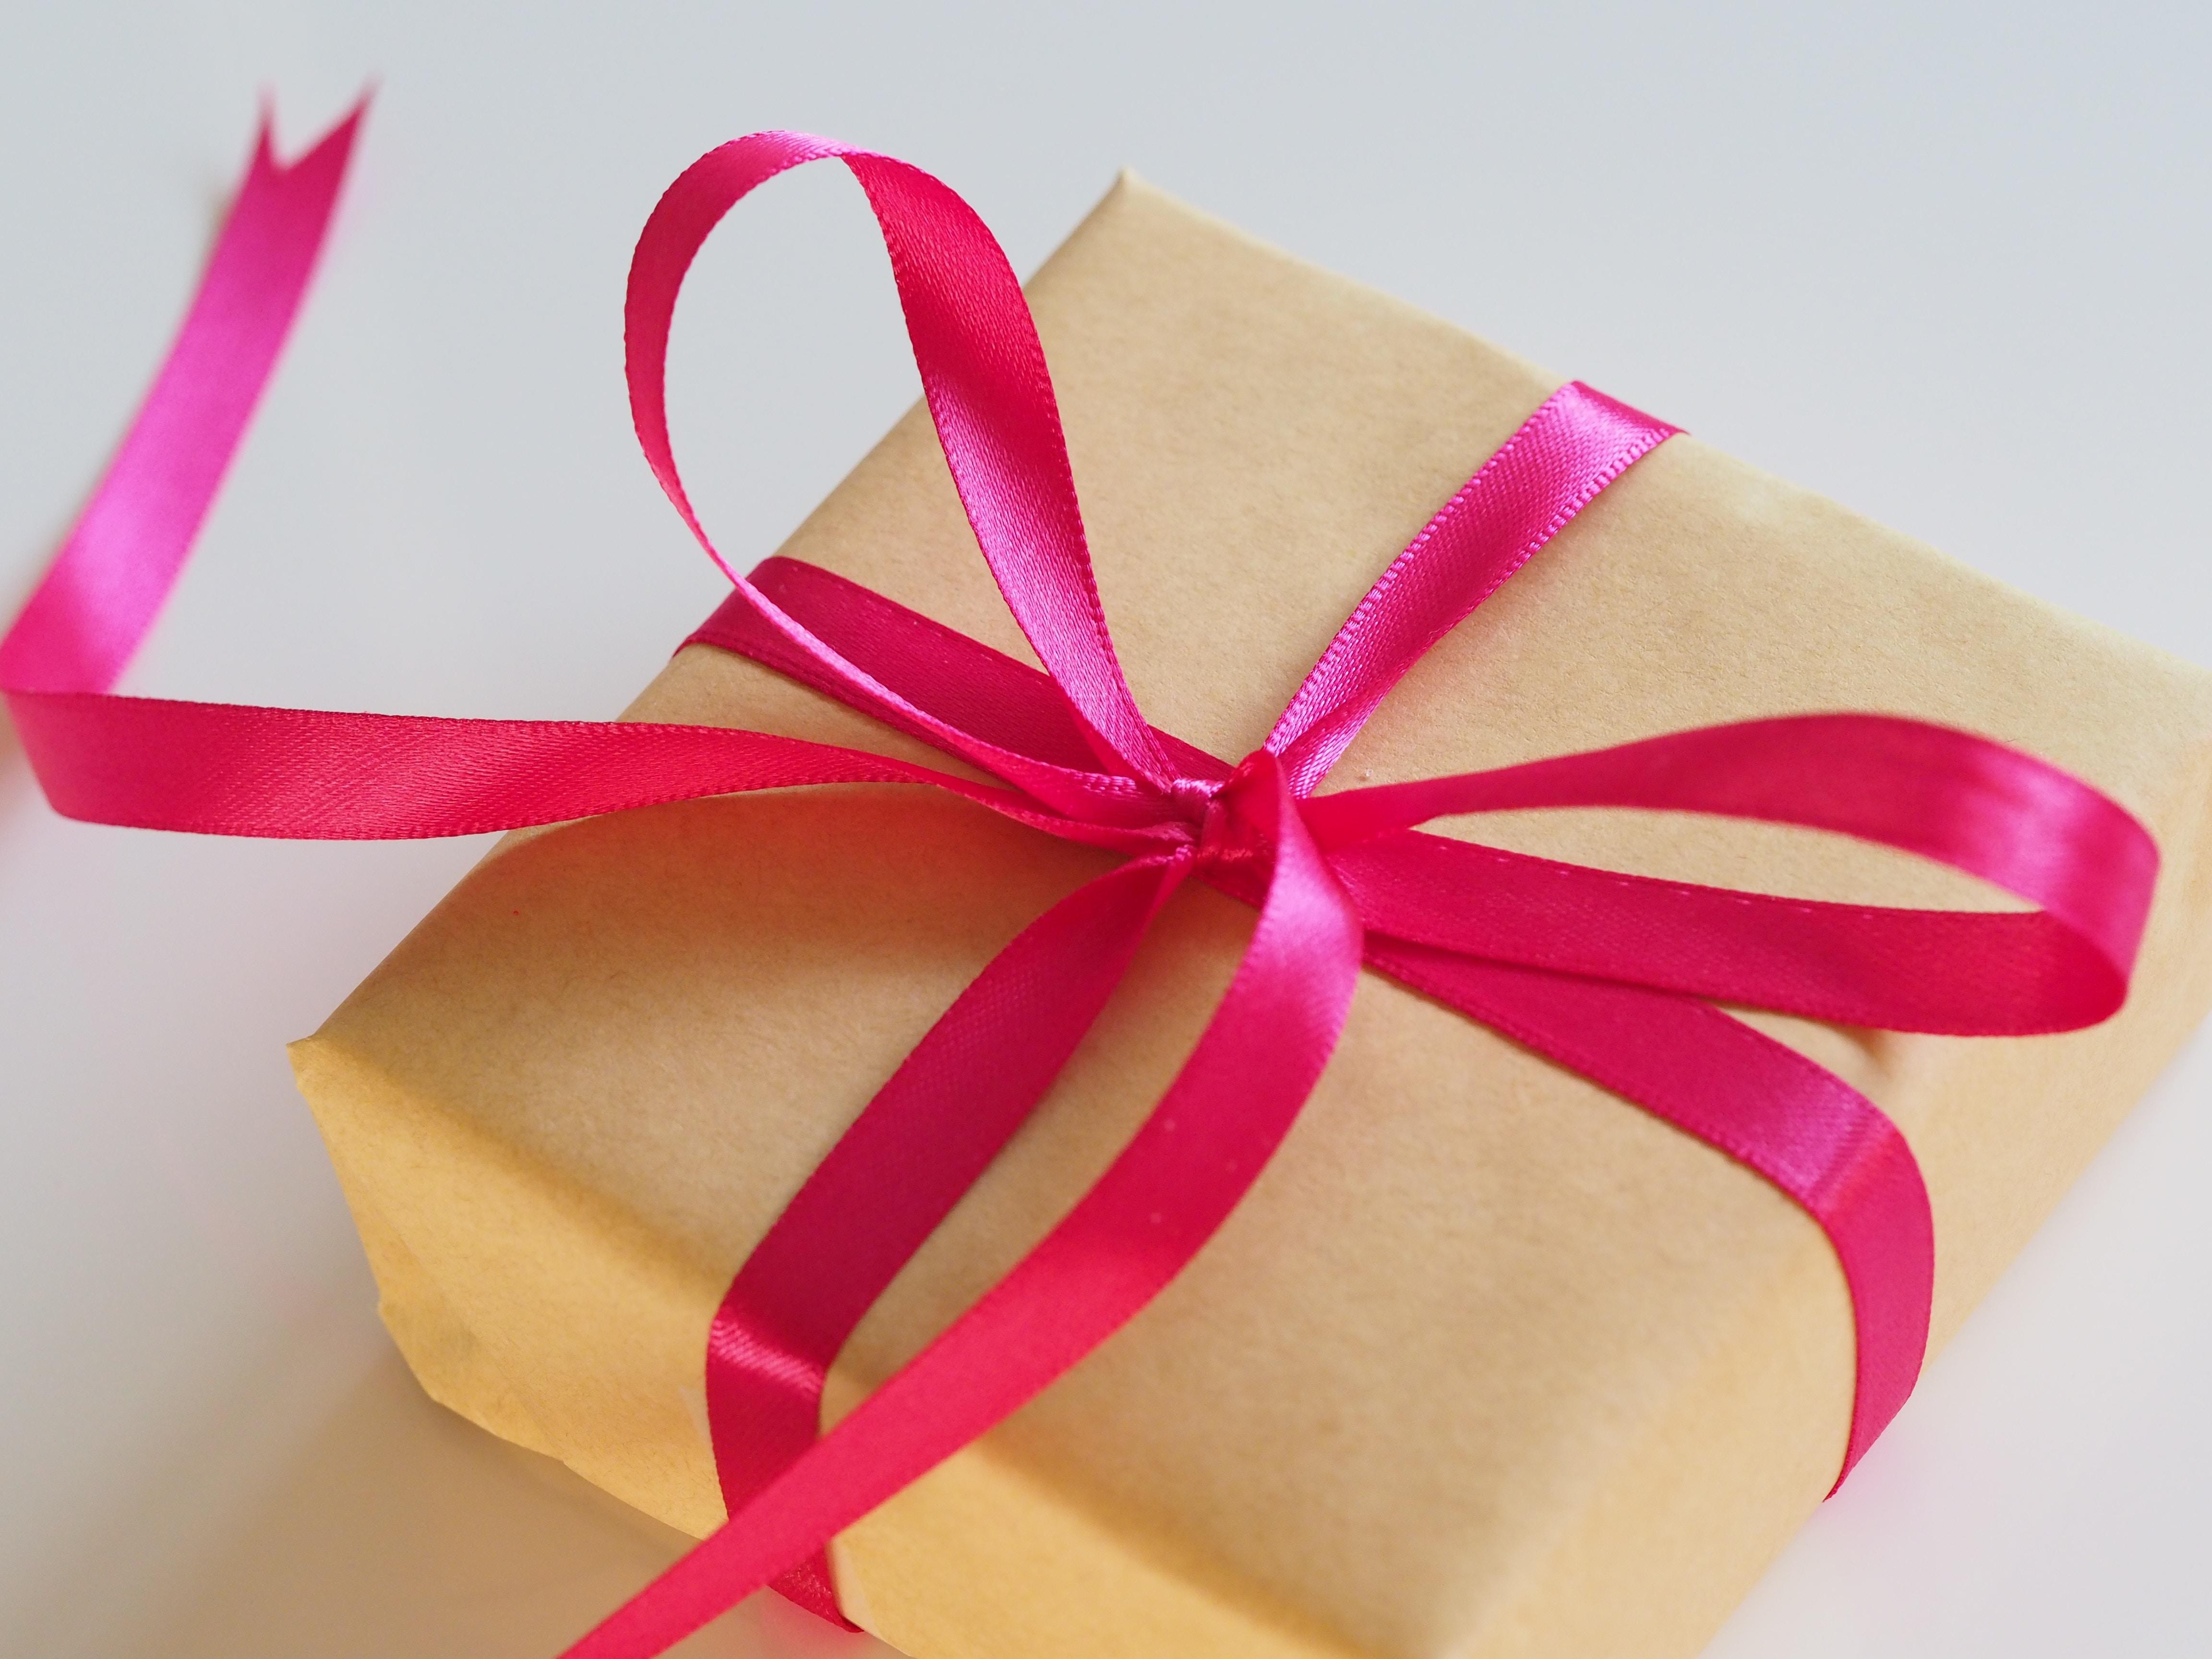 Skicka paket enkelt